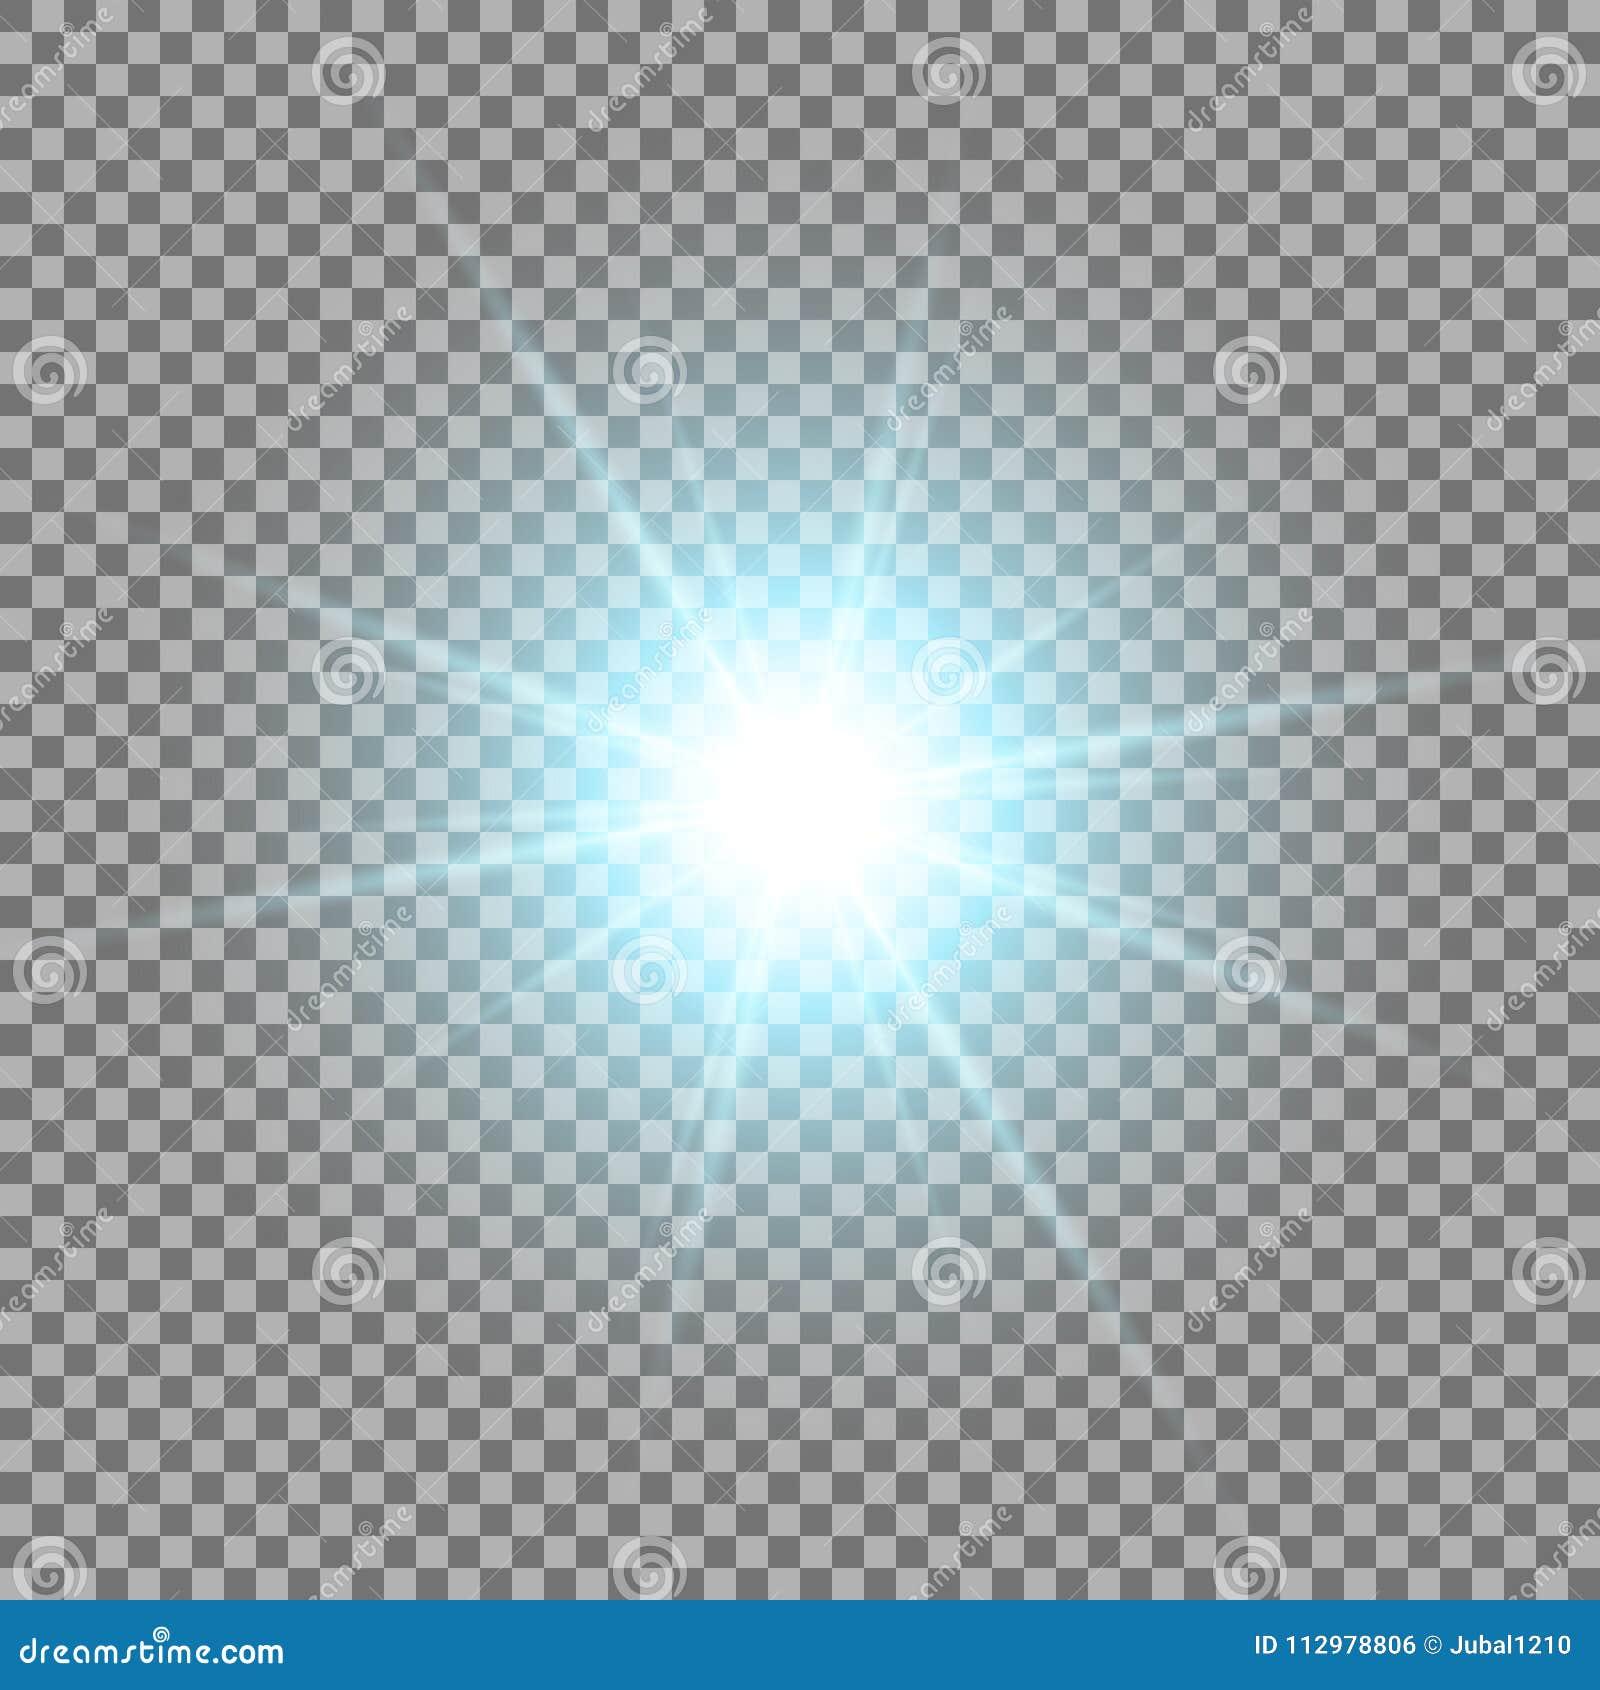 Shining star on transparent background, aqua color